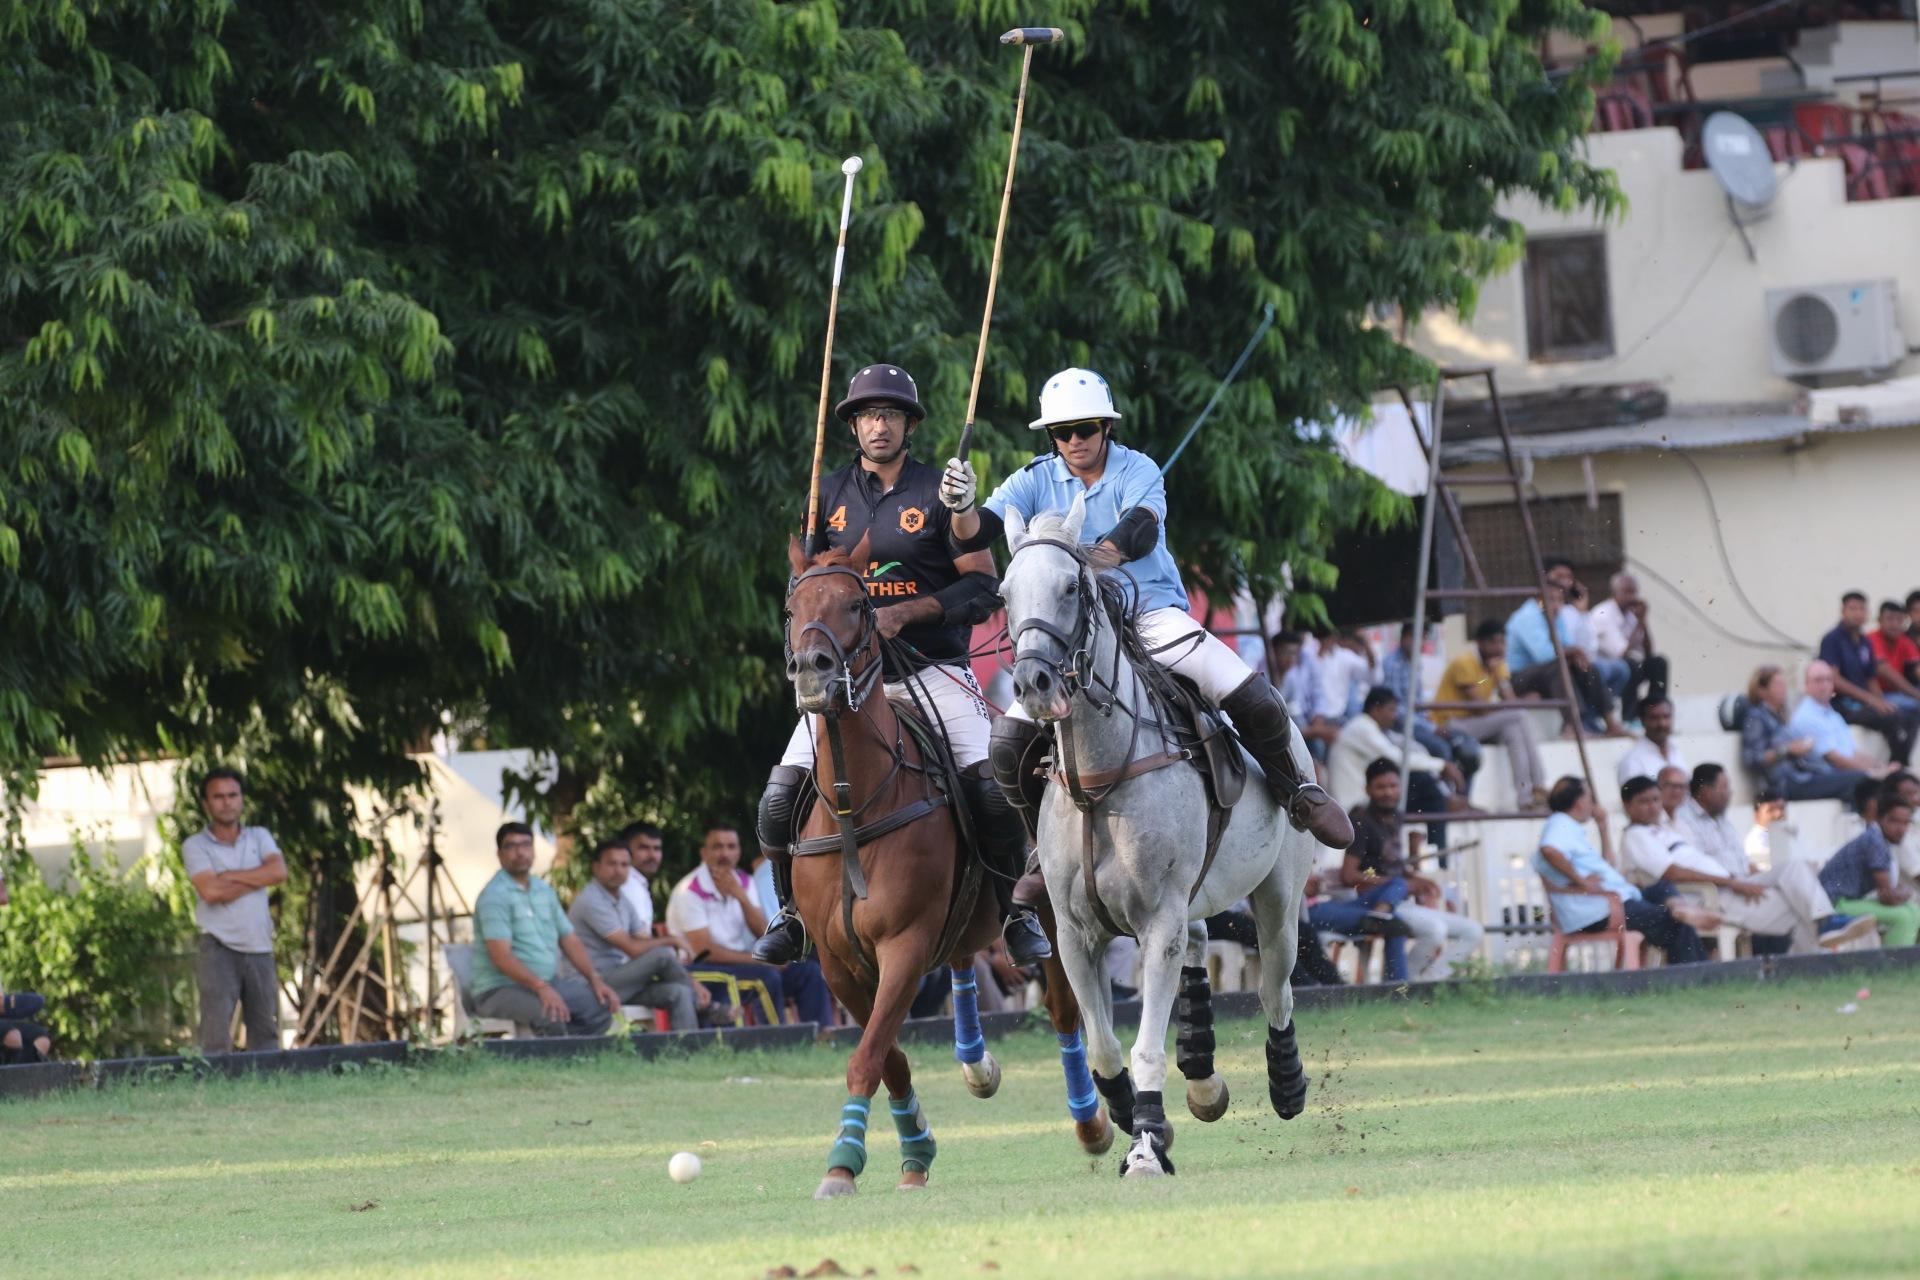 Mustang, Mustang Polo, Rajasthan Polo Club, General Amar Singh Kanota Cup, Krishna Polo, Jaipur, Rajasthan, Indian Polo Season, Samir Suhag, Vishal Singh, Vandit Golecha, Ashvini Sharma, Th Lokendra Singh Rathore, Dhananjai Singh Rathore, Vishwaraj